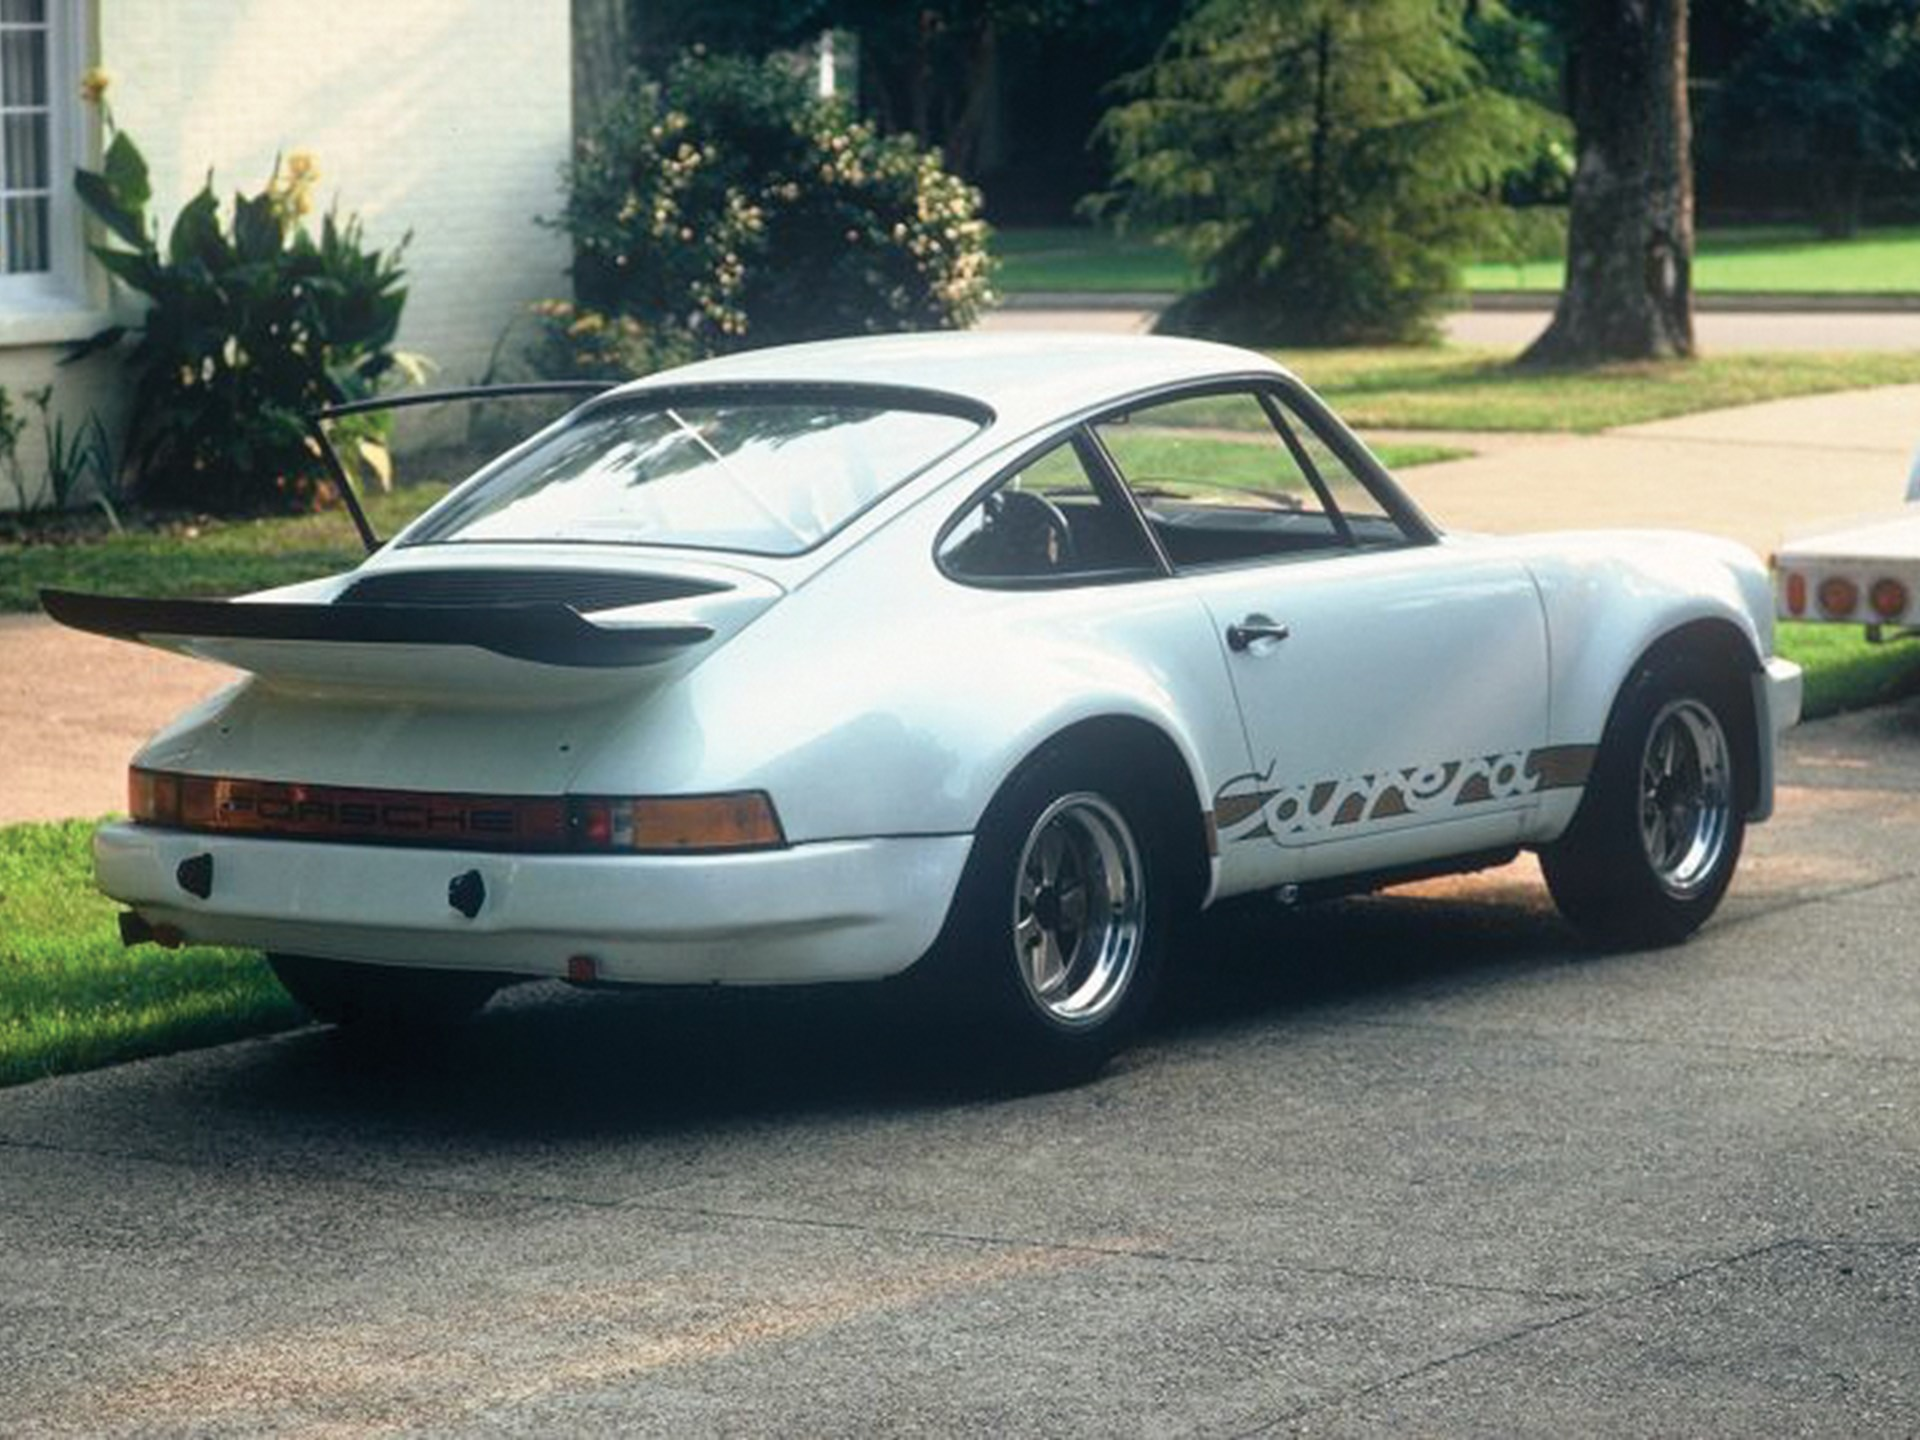 Car Lots In Memphis >> RM Sotheby's - 1974 Porsche 911 Carrera RS 3.0 | Amelia Island 2017